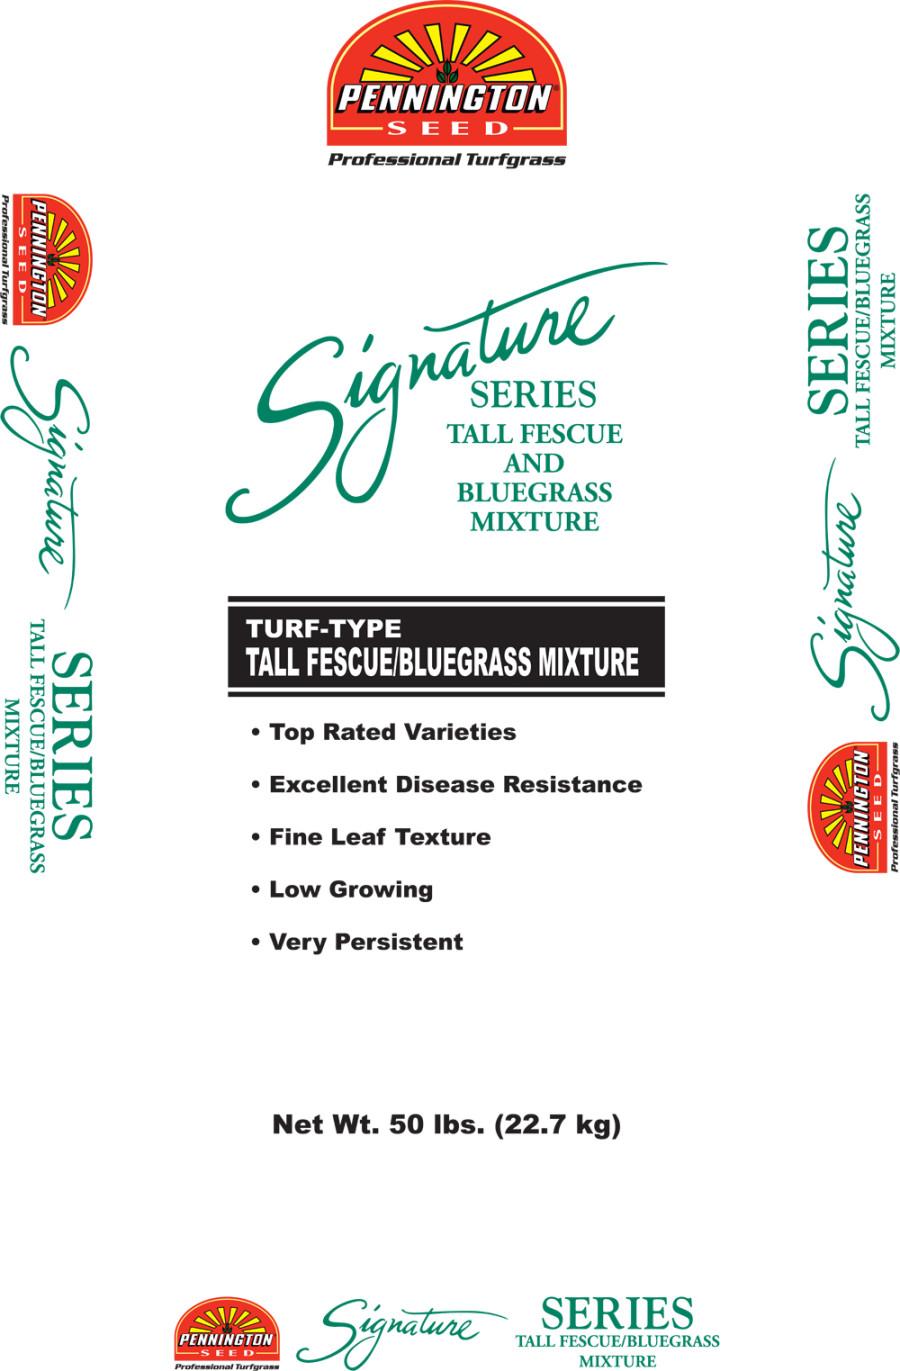 Pennington Signature Series Tall Fescue & Bluegrass Mixture 1ea/50 lb